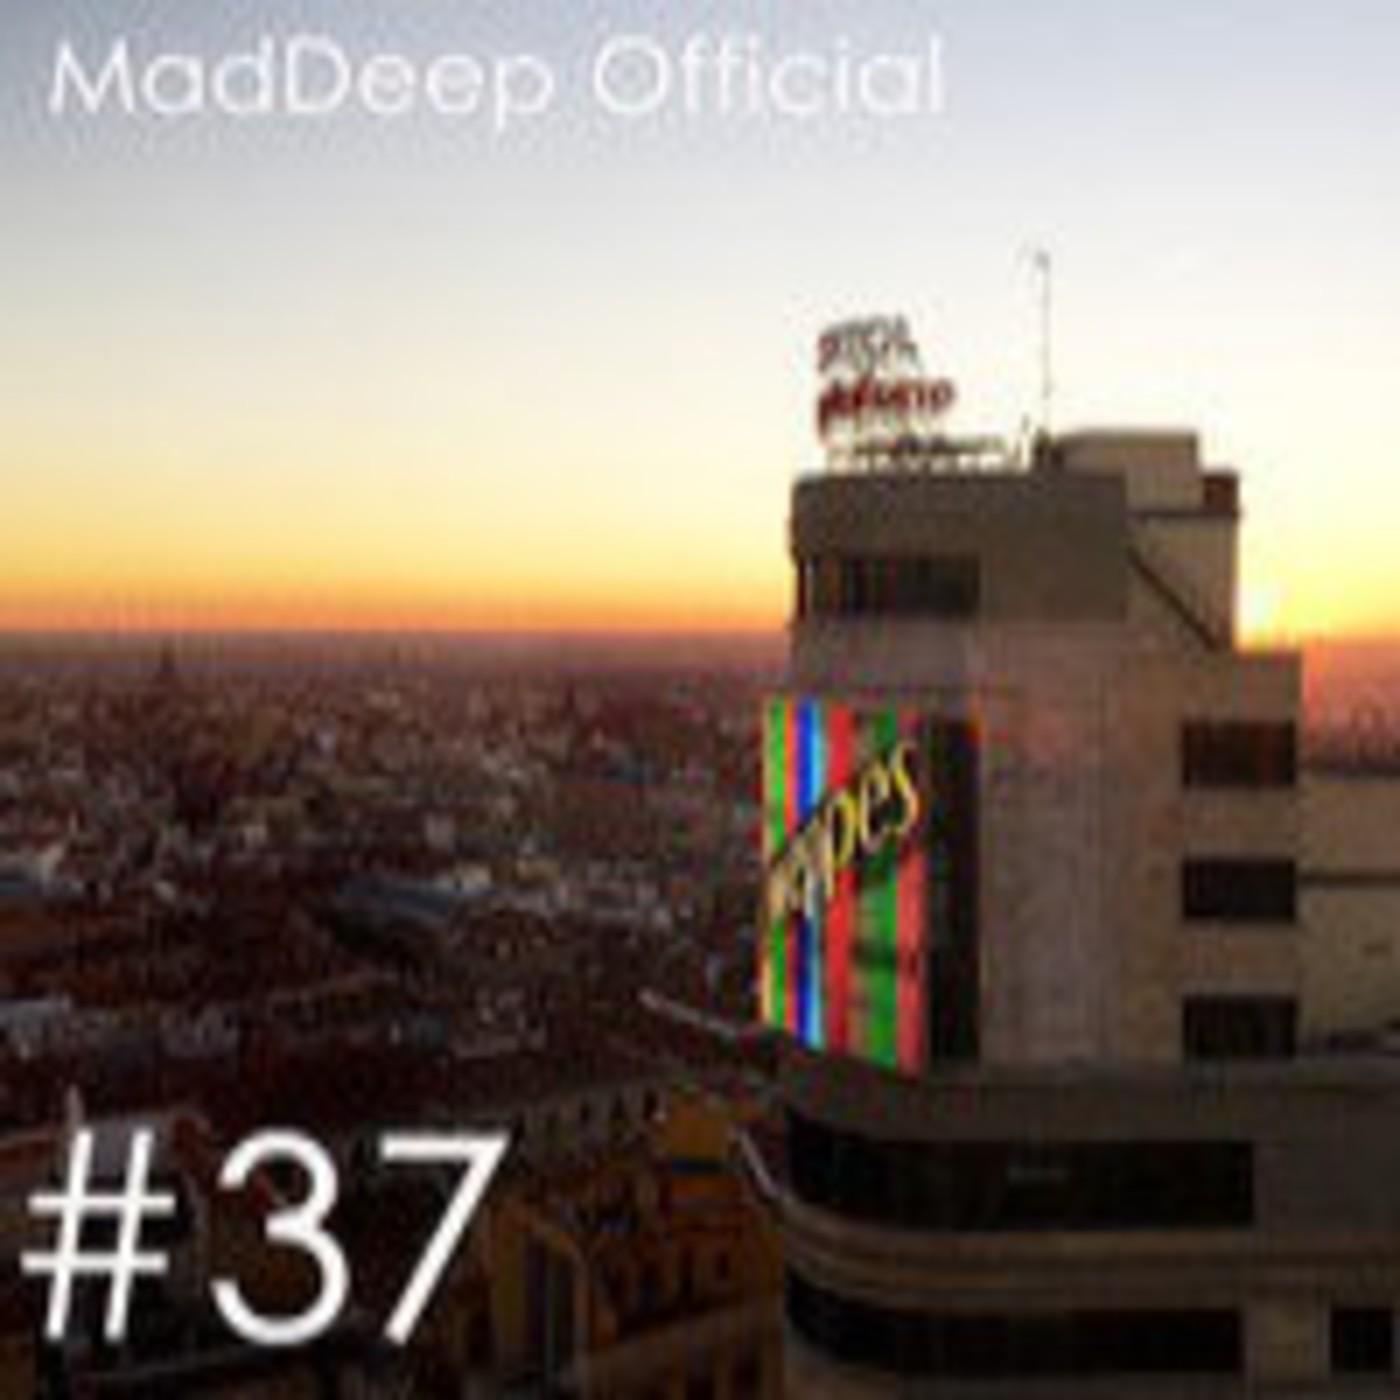 Best Deep House Vocal January 2015 #037